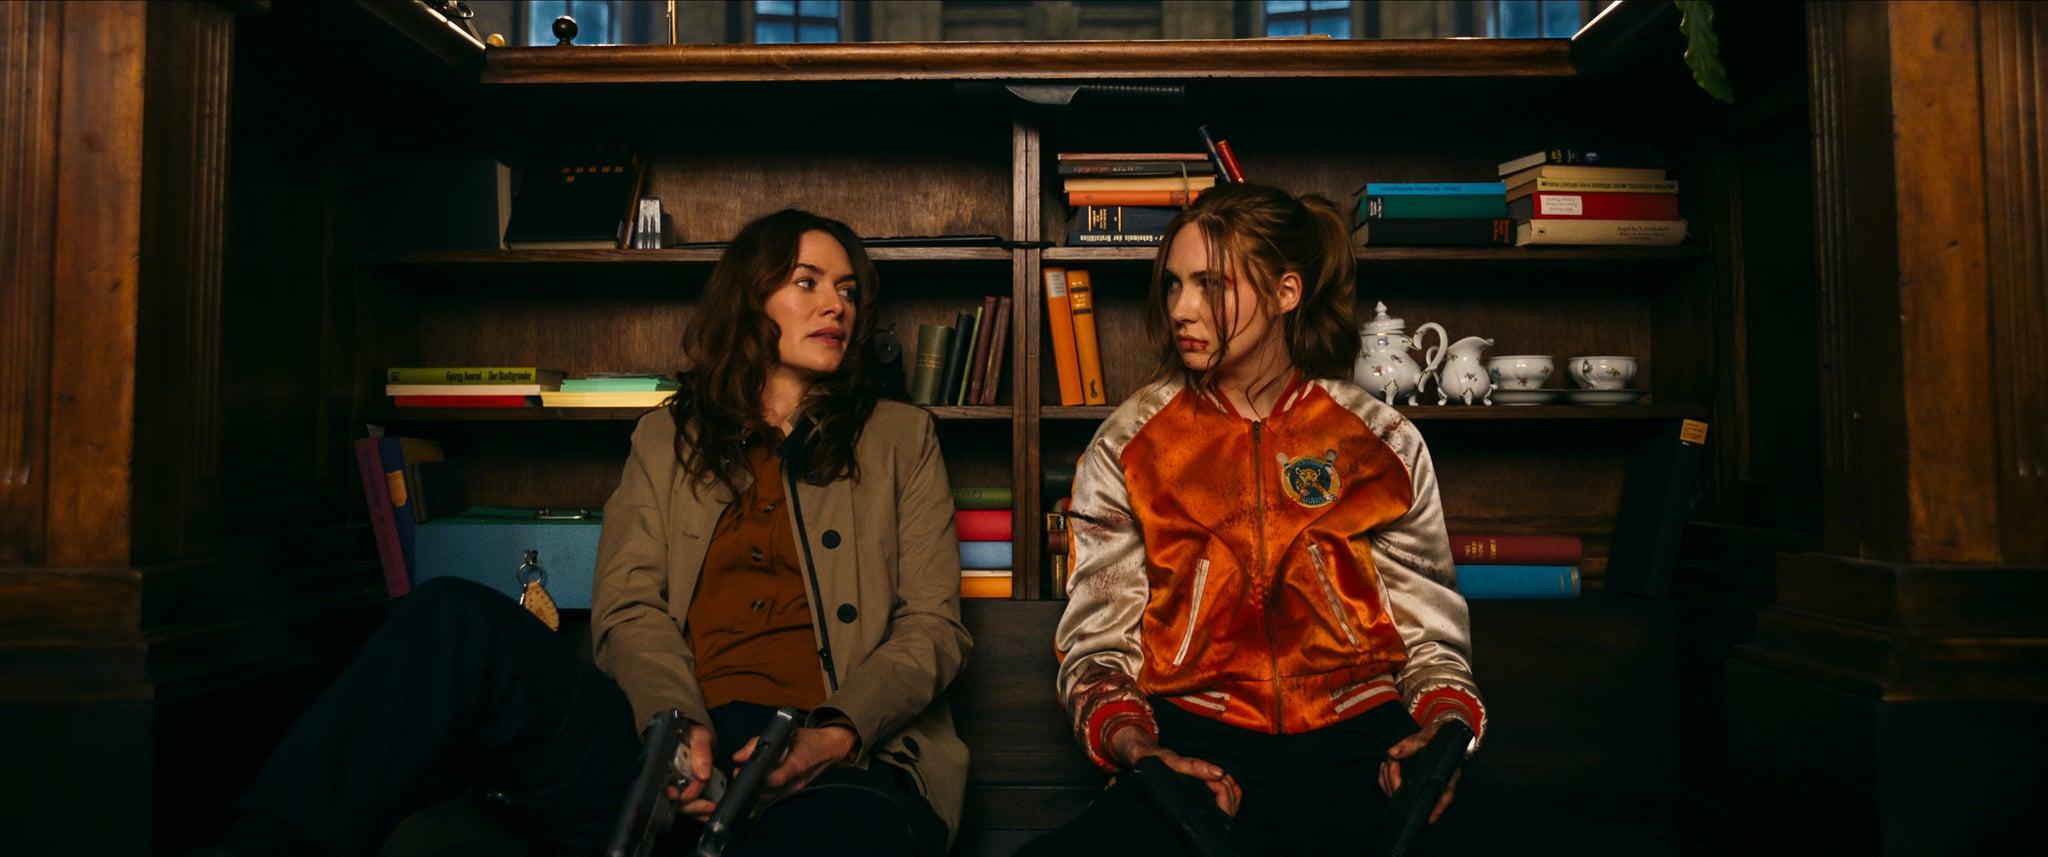 GUNPOWDER MILKSHAKE (L-R): LENA HEADEY as SCARLET, KAREN GILLAN as SAM. Cr: STUDIOCANAL © 2021